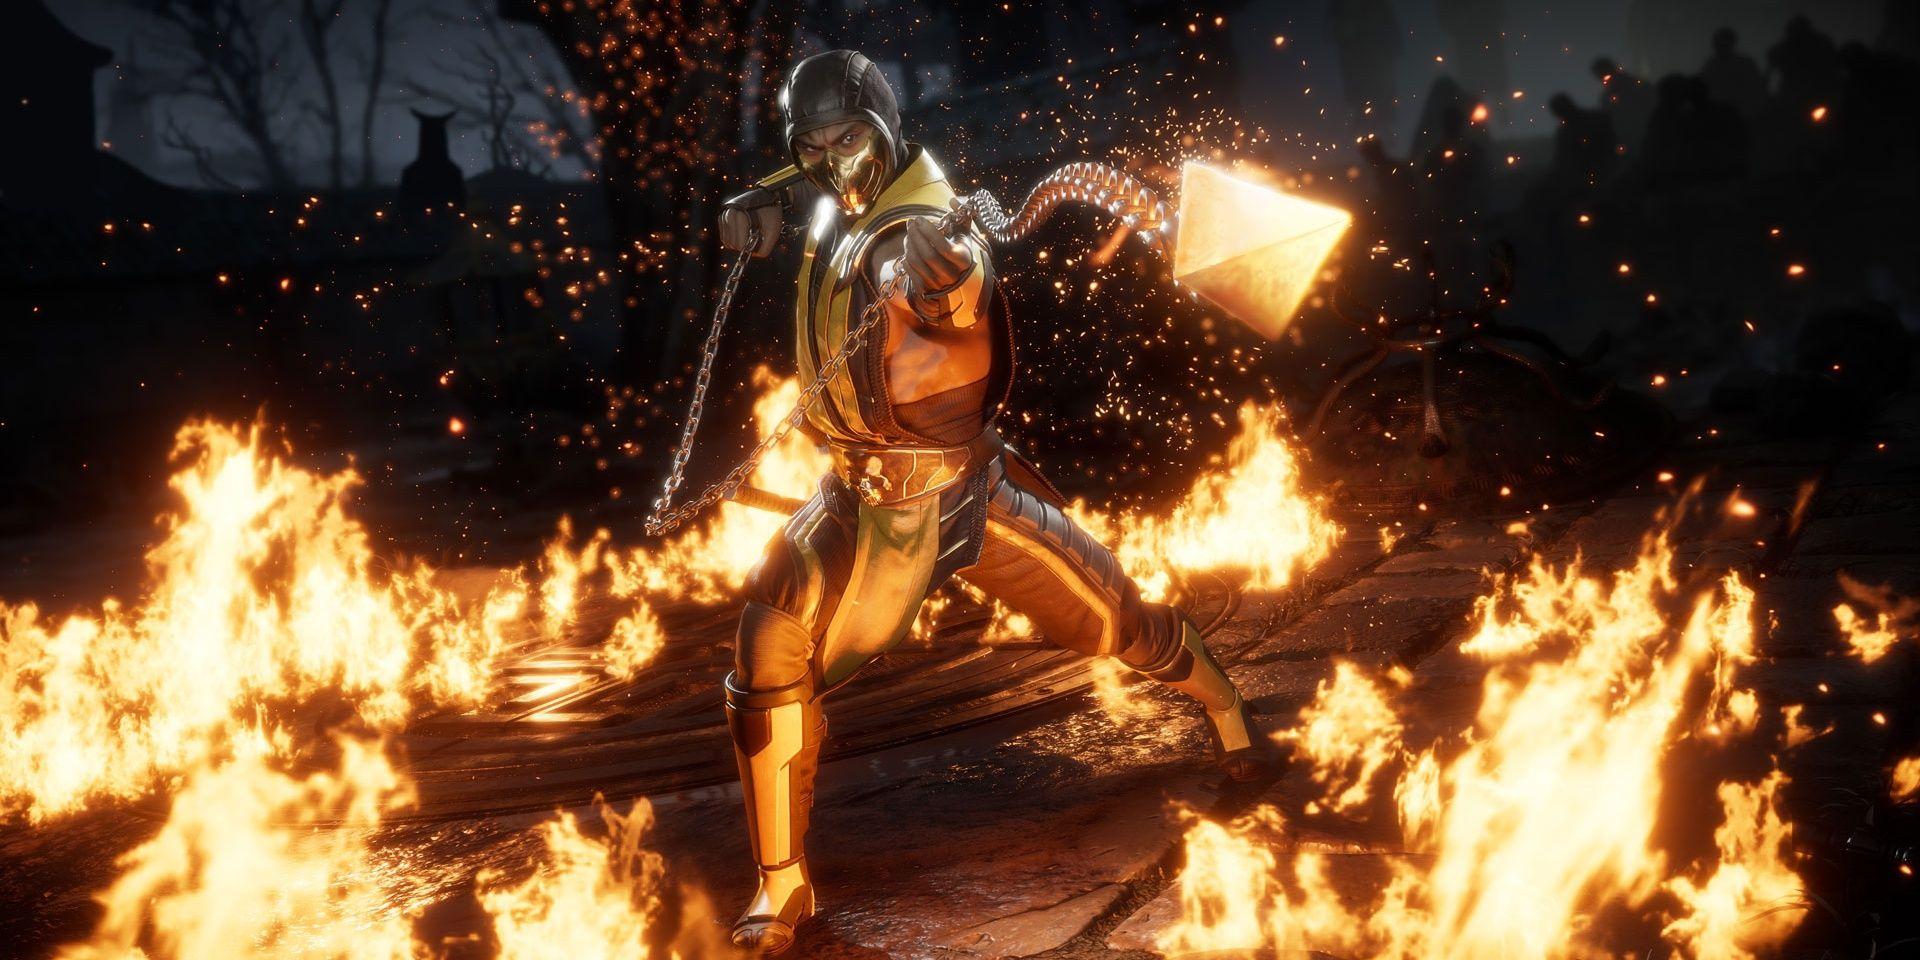 McFarlane Toys Teases Mortal Kombat 11 Figures